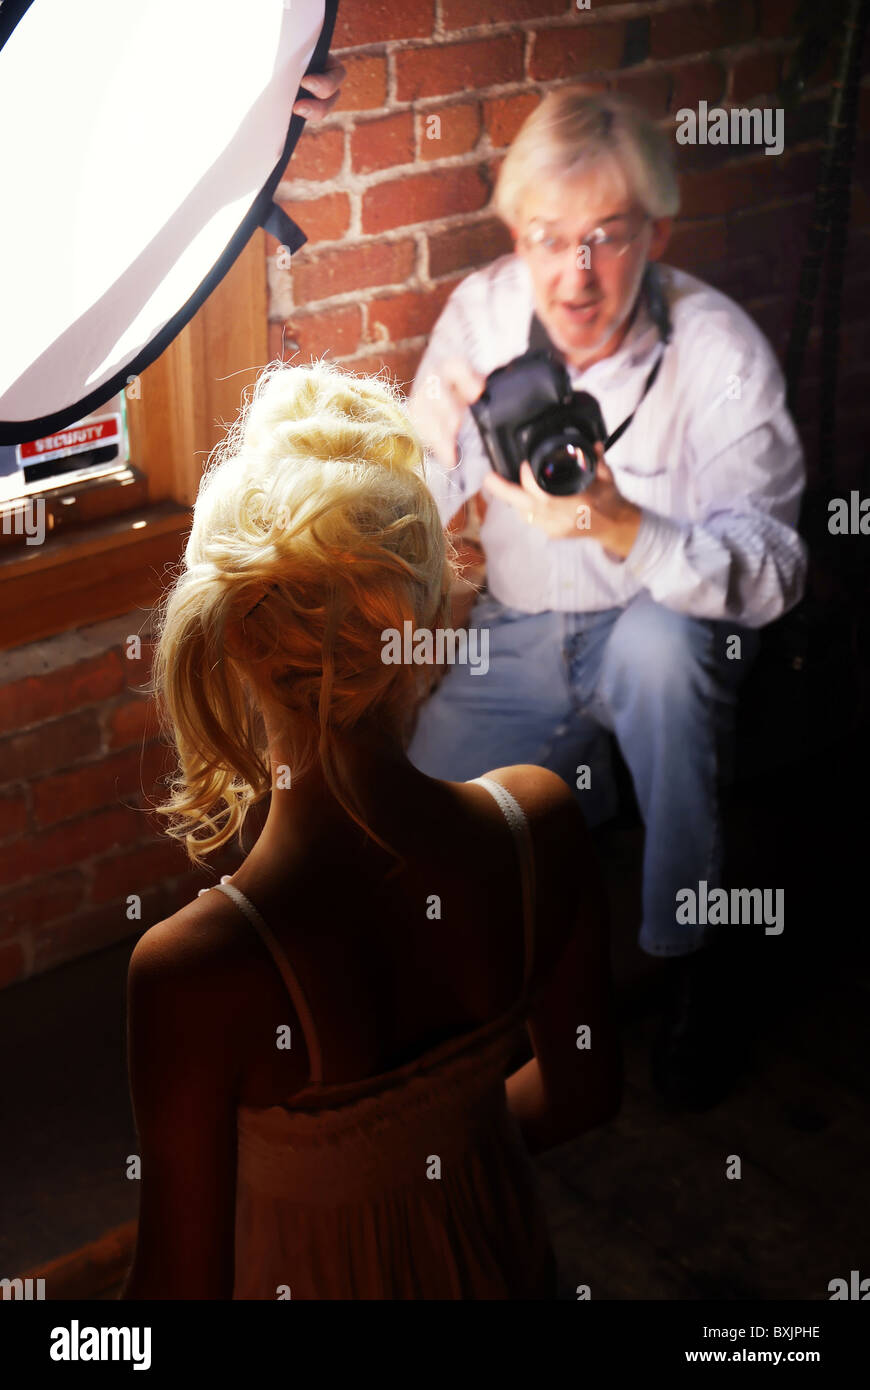 Blonde model poses in front of photographer, Sacramento Fashion Week, California Stock Photo